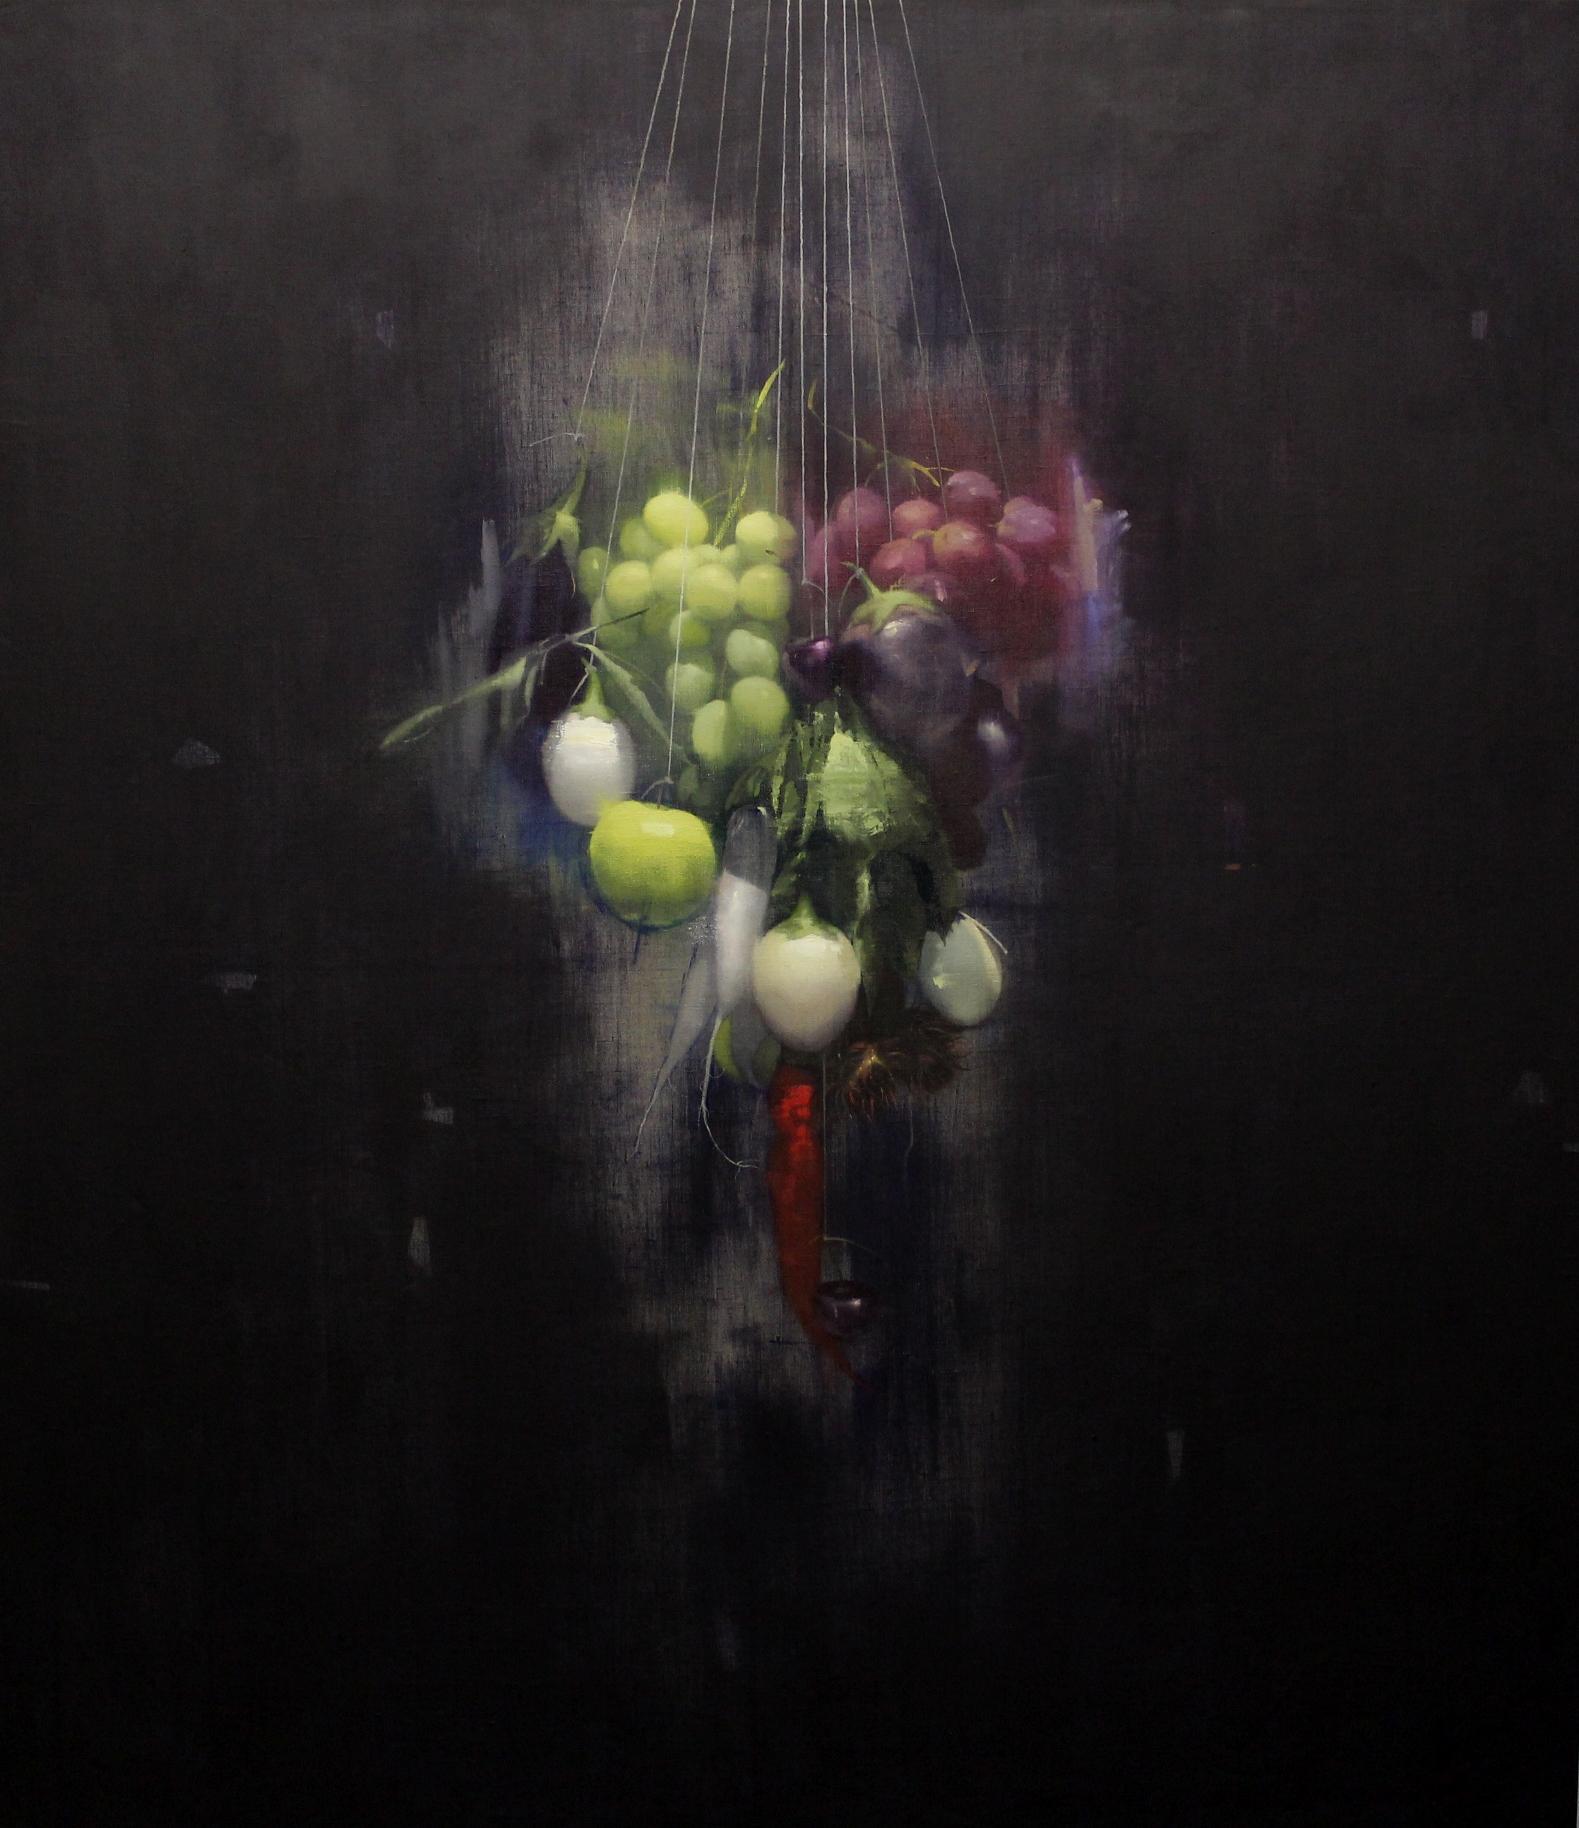 Festoon 8 - Still Life by Christopher Kettle